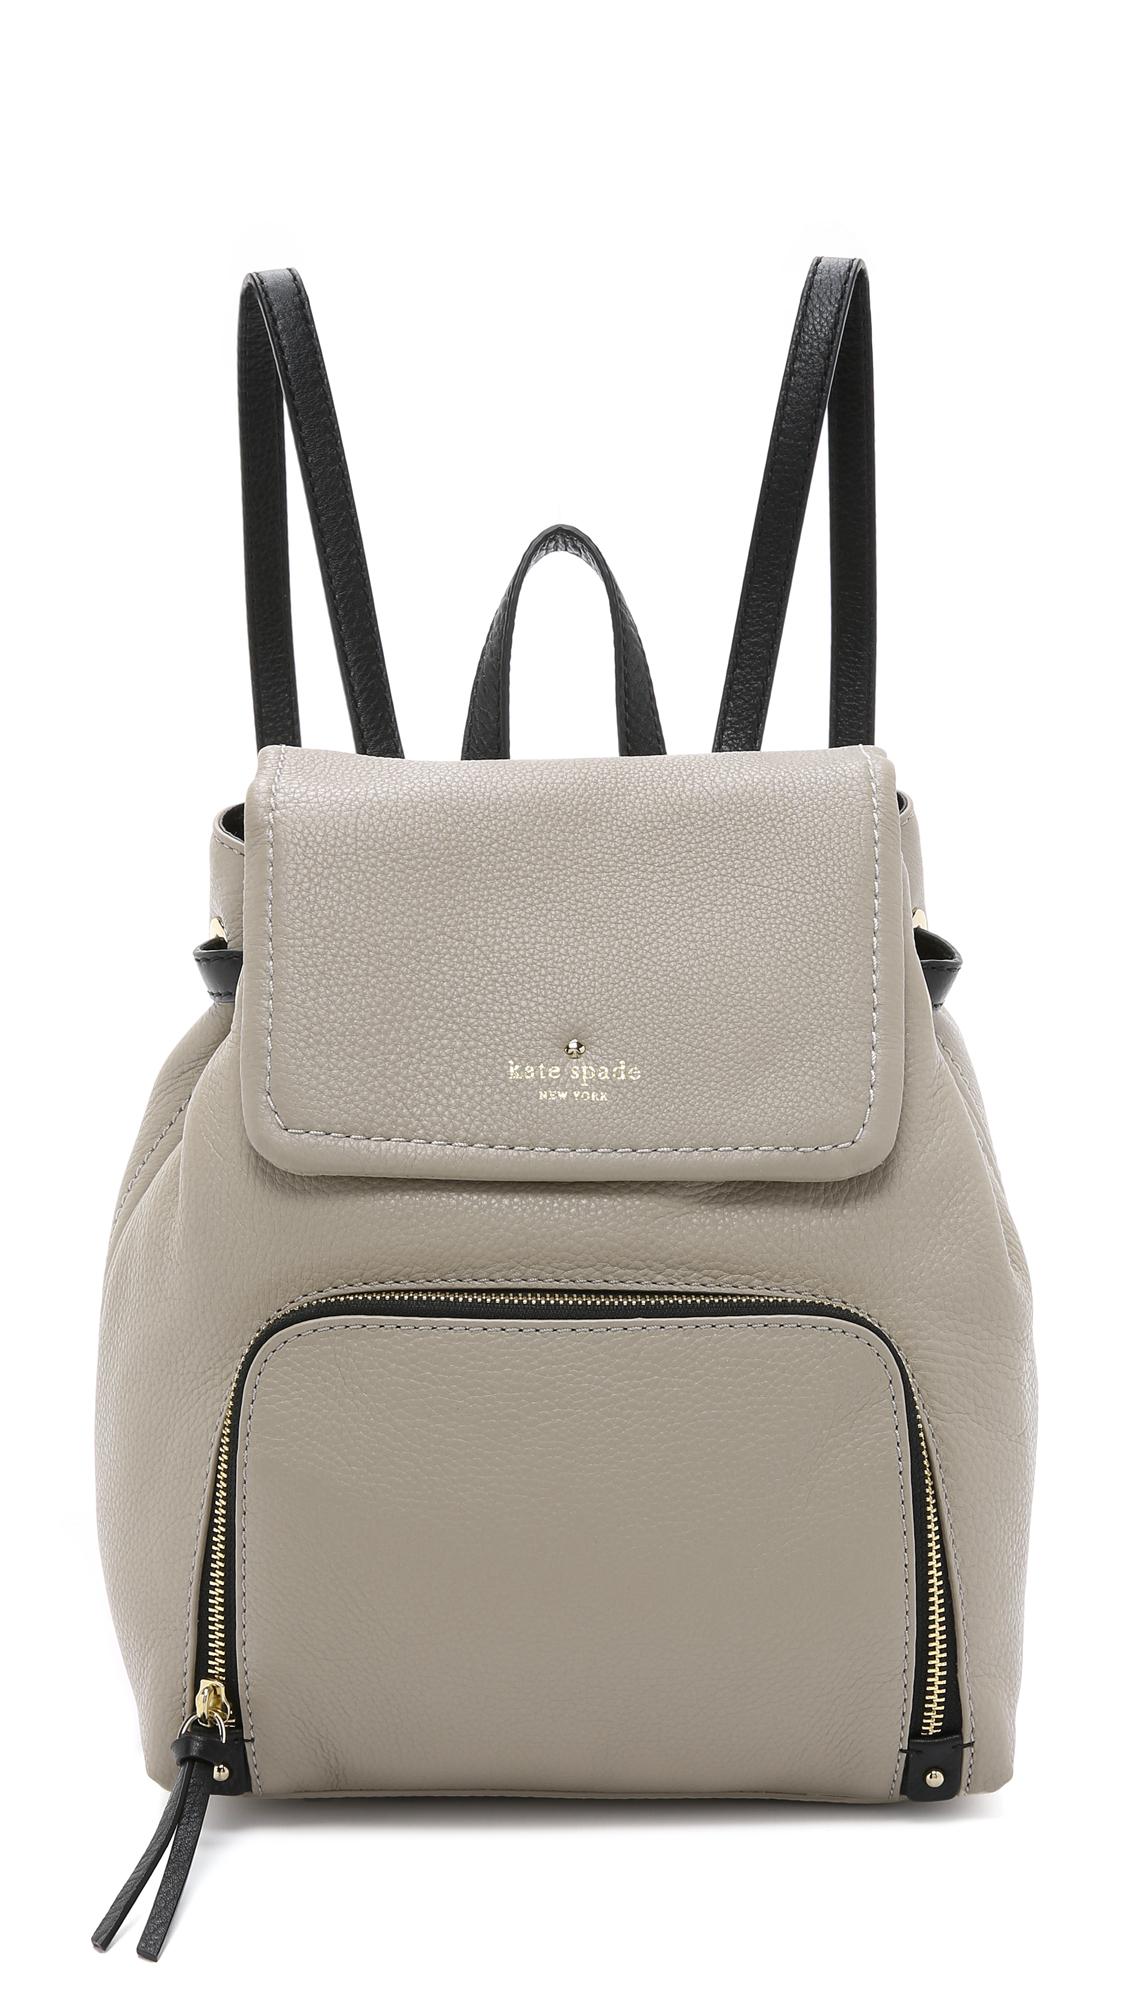 9c6c815568c71 Kate Spade New York Charley Backpack